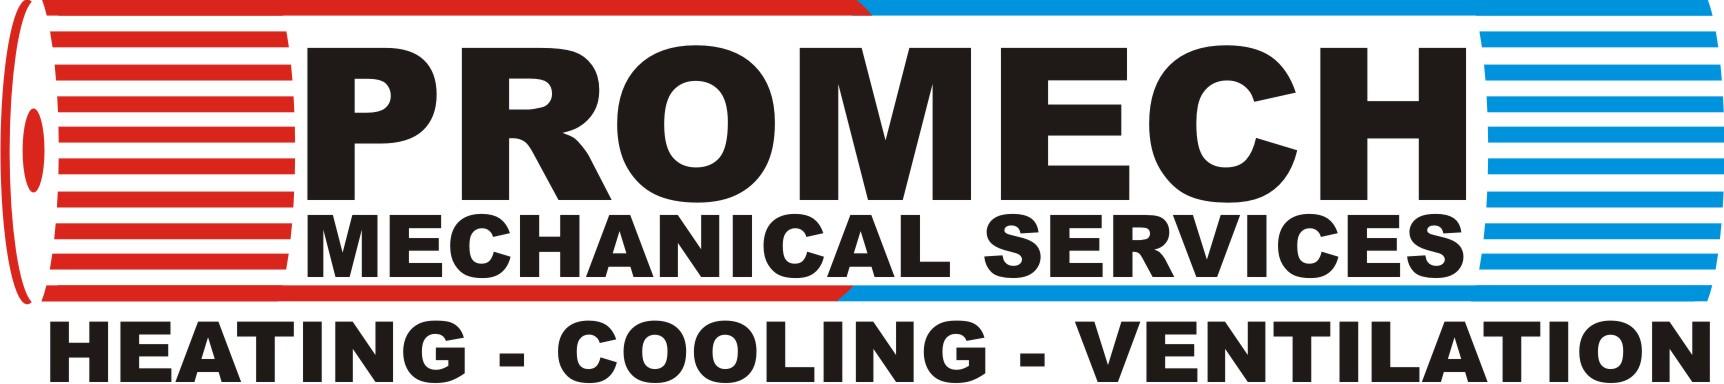 Promech Mechanical Services